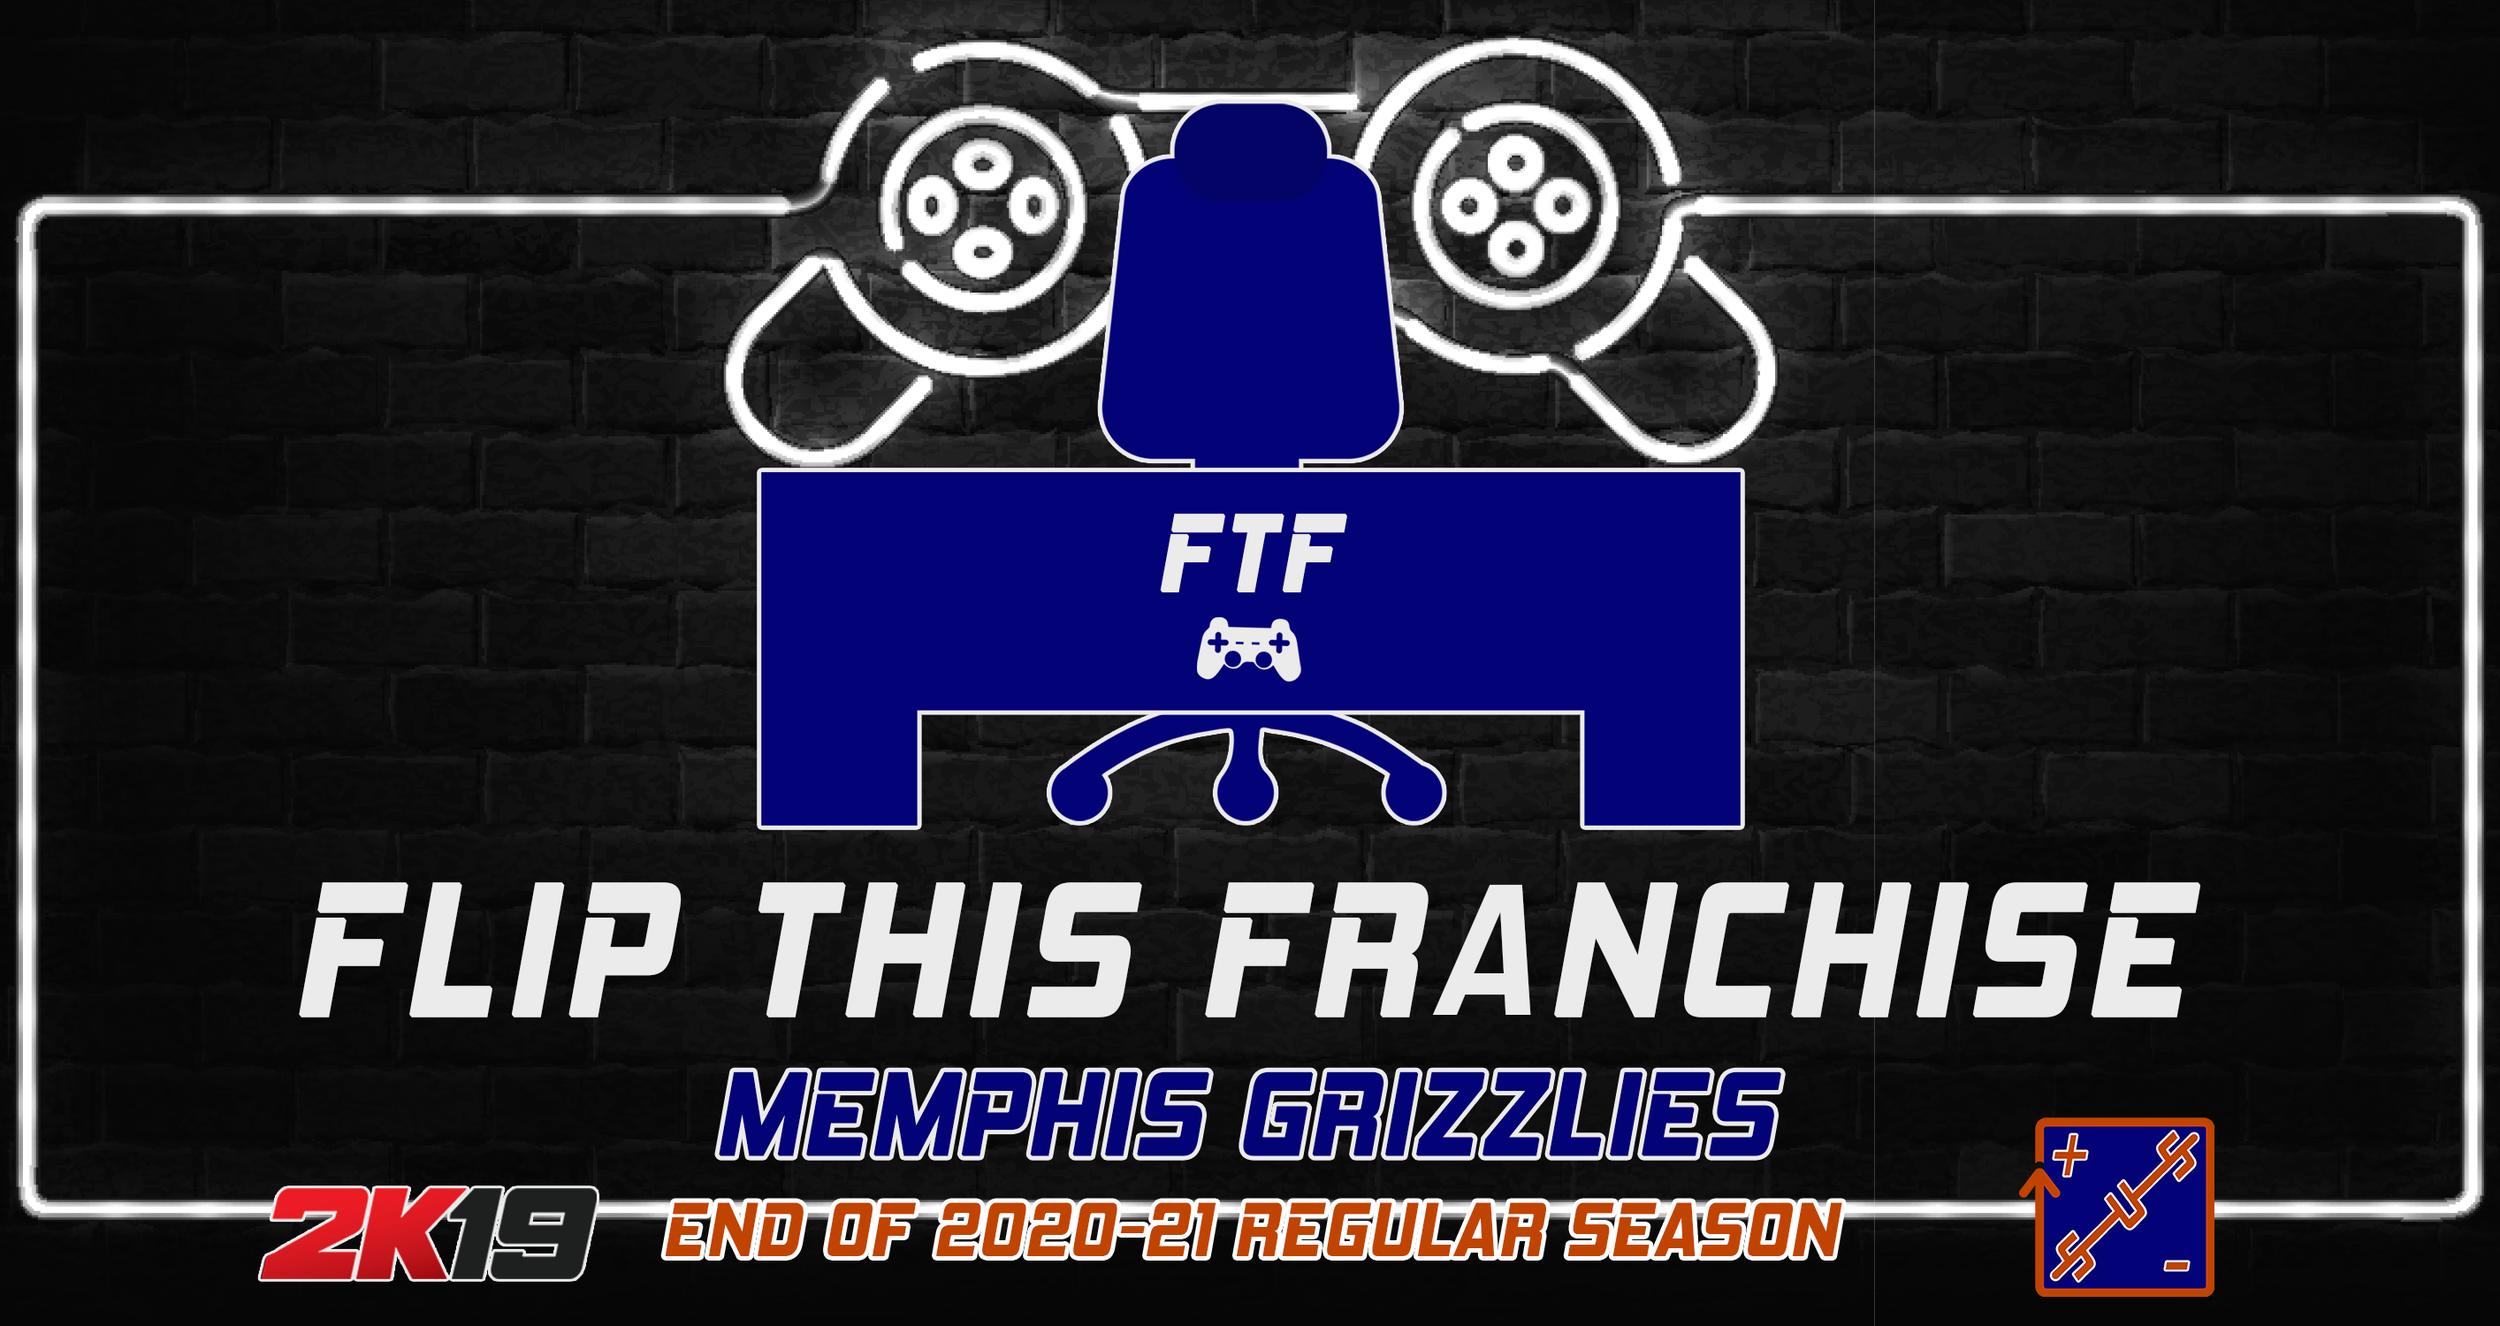 Nba Preseason Schedule 2020-21 FTF Memphis Grizzlies   End of 2020 21 Regular Season — Straight